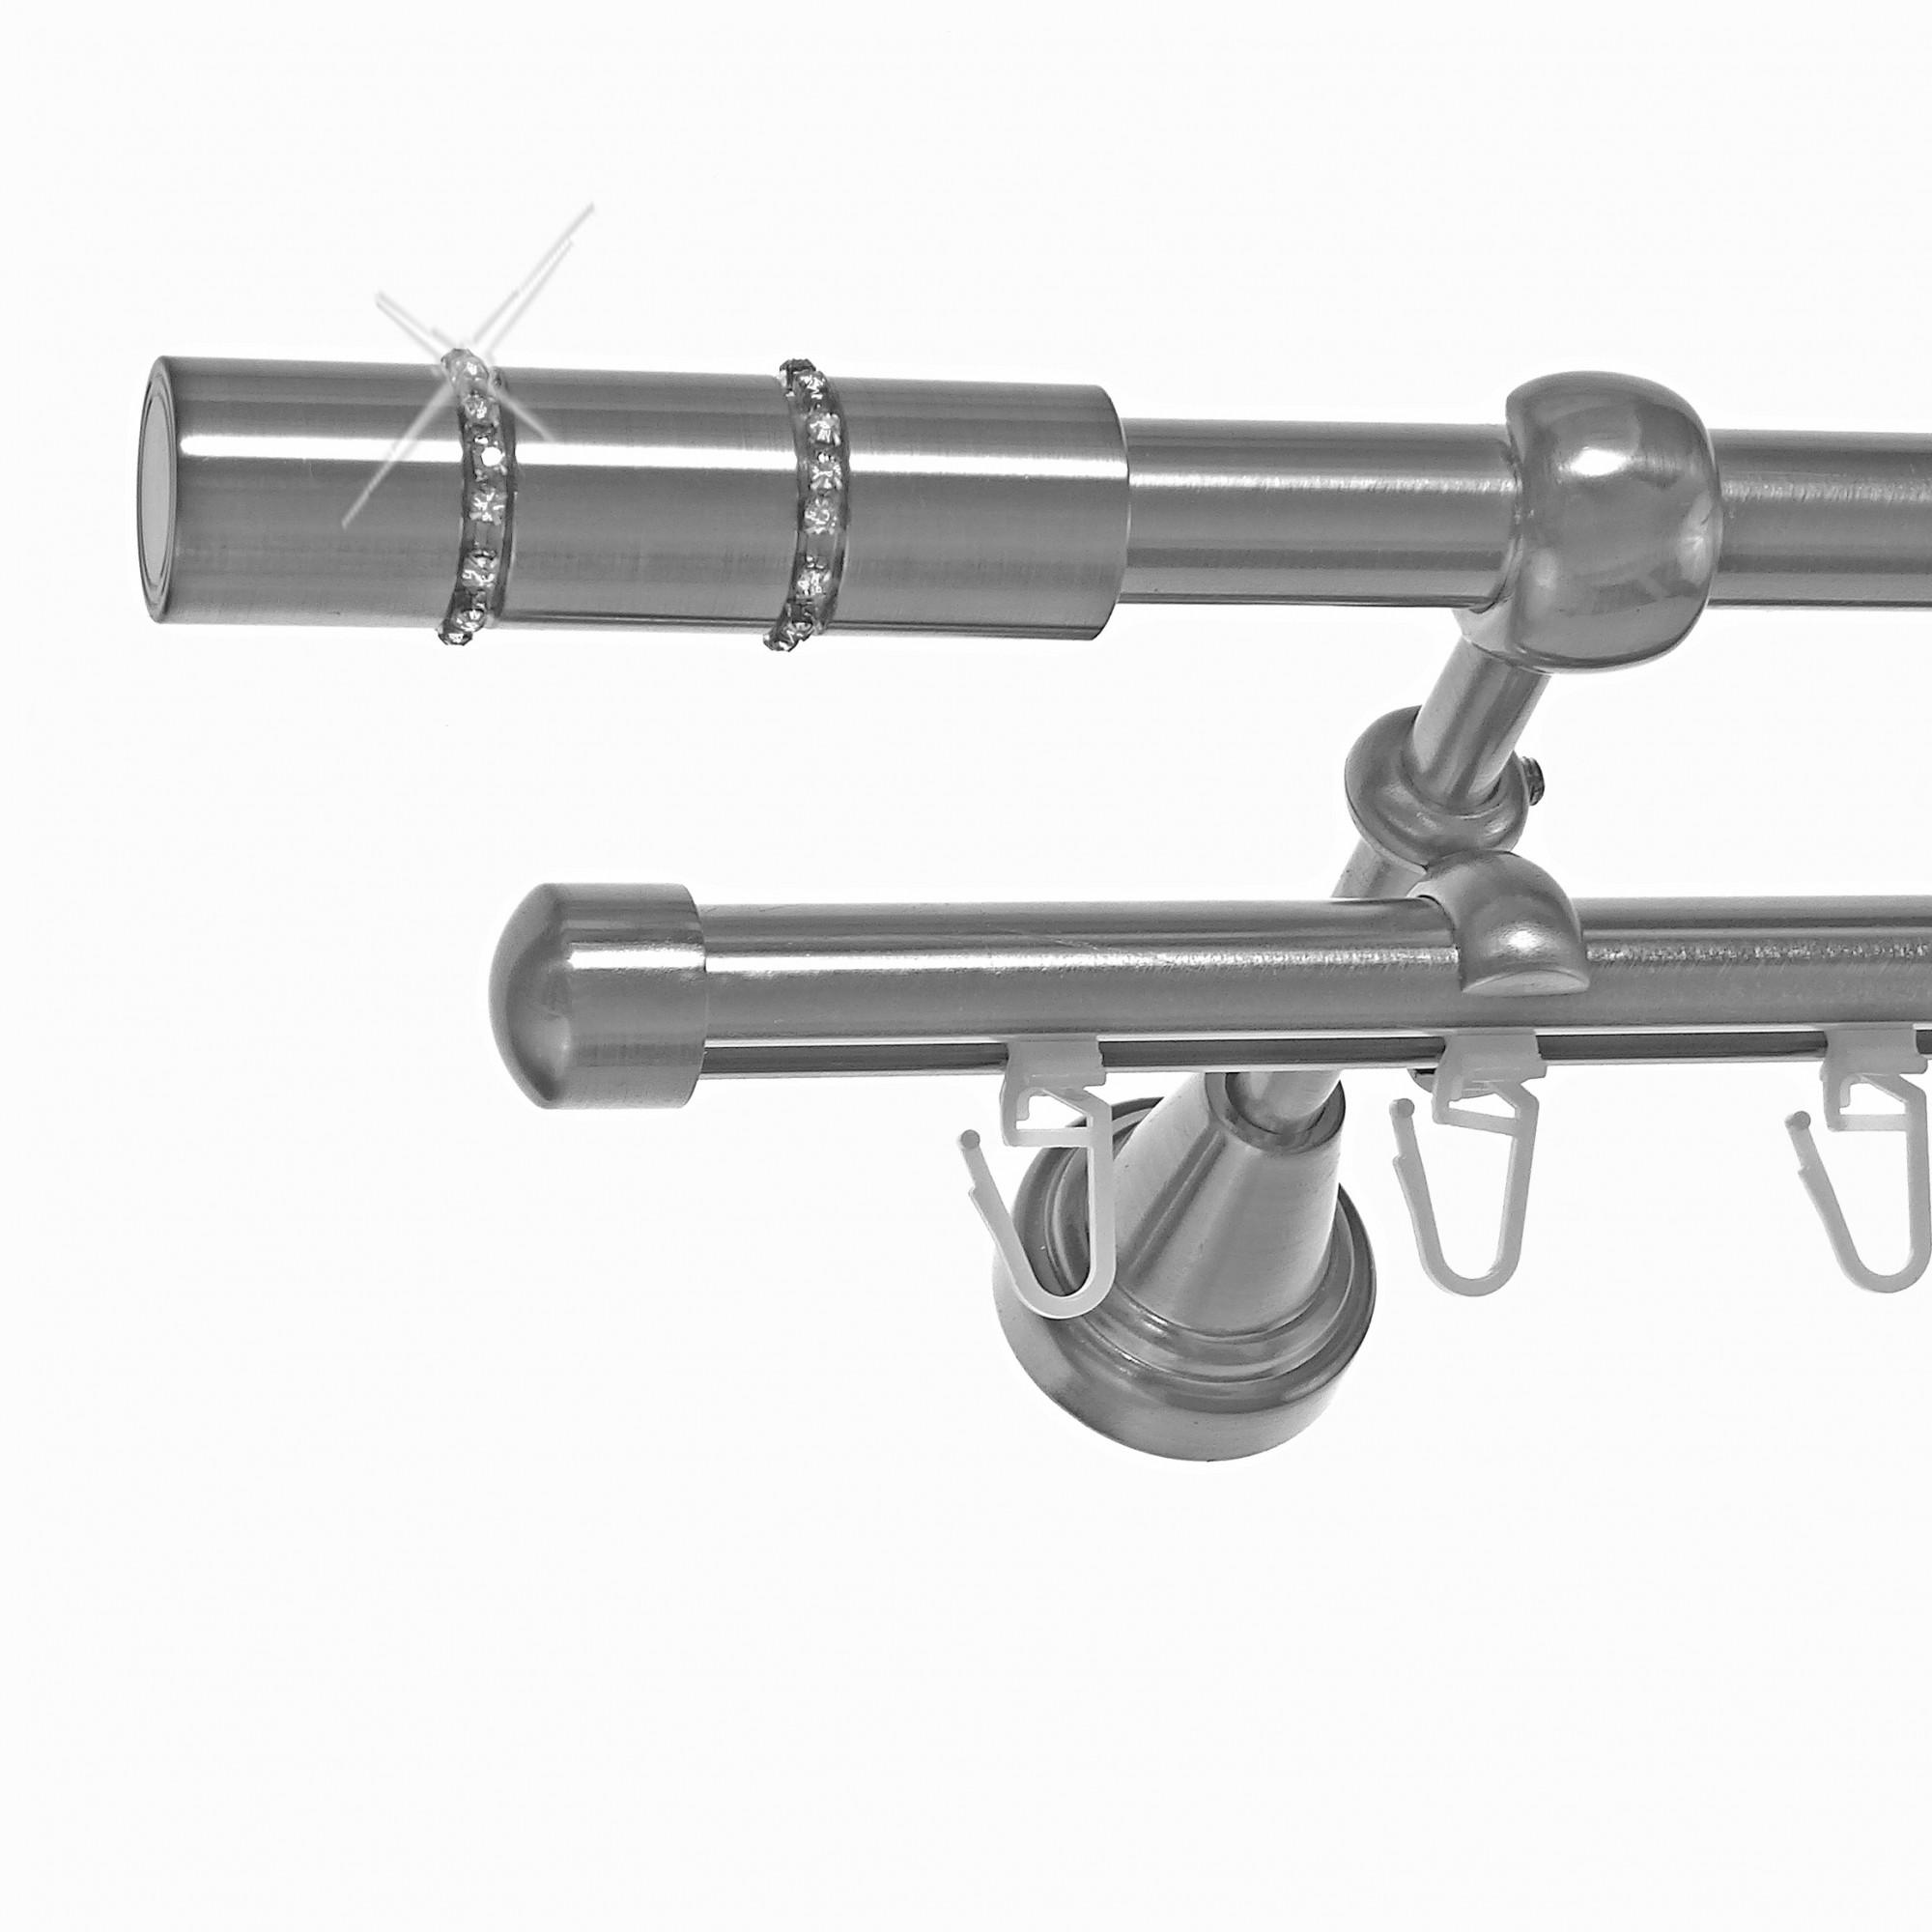 Gardinenstangenhalter Edelstahl rohr innenlauf gardinenstange edelstahl look ø 16mm zur